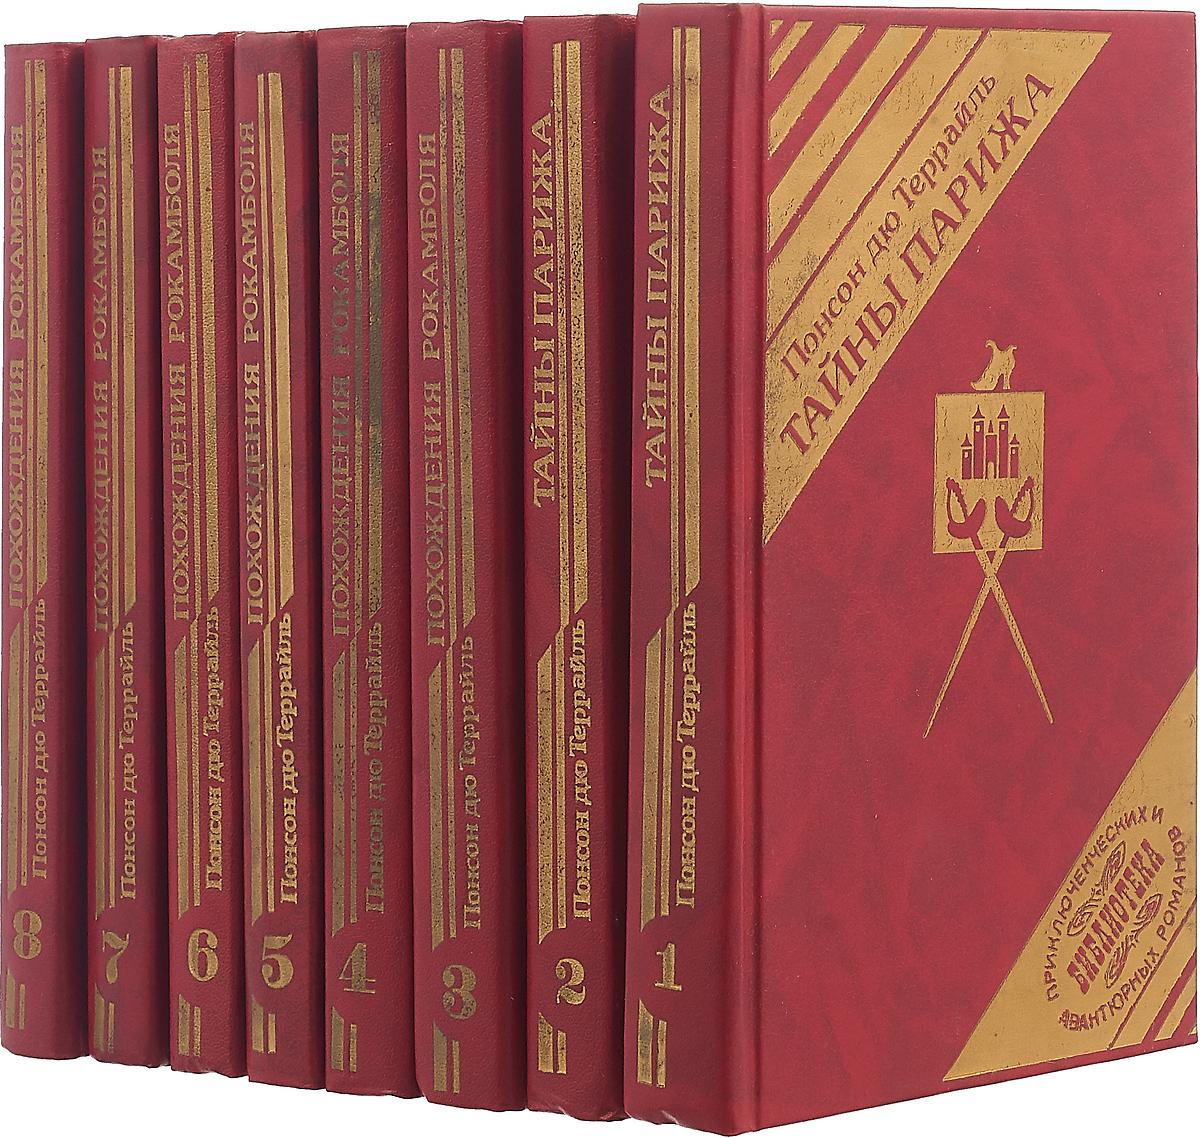 Пьер Алексис Понсон дю Террайль Понсон дю Террайль (комплект из 8 книг) касслер к дю брюл дж молчаливые воды